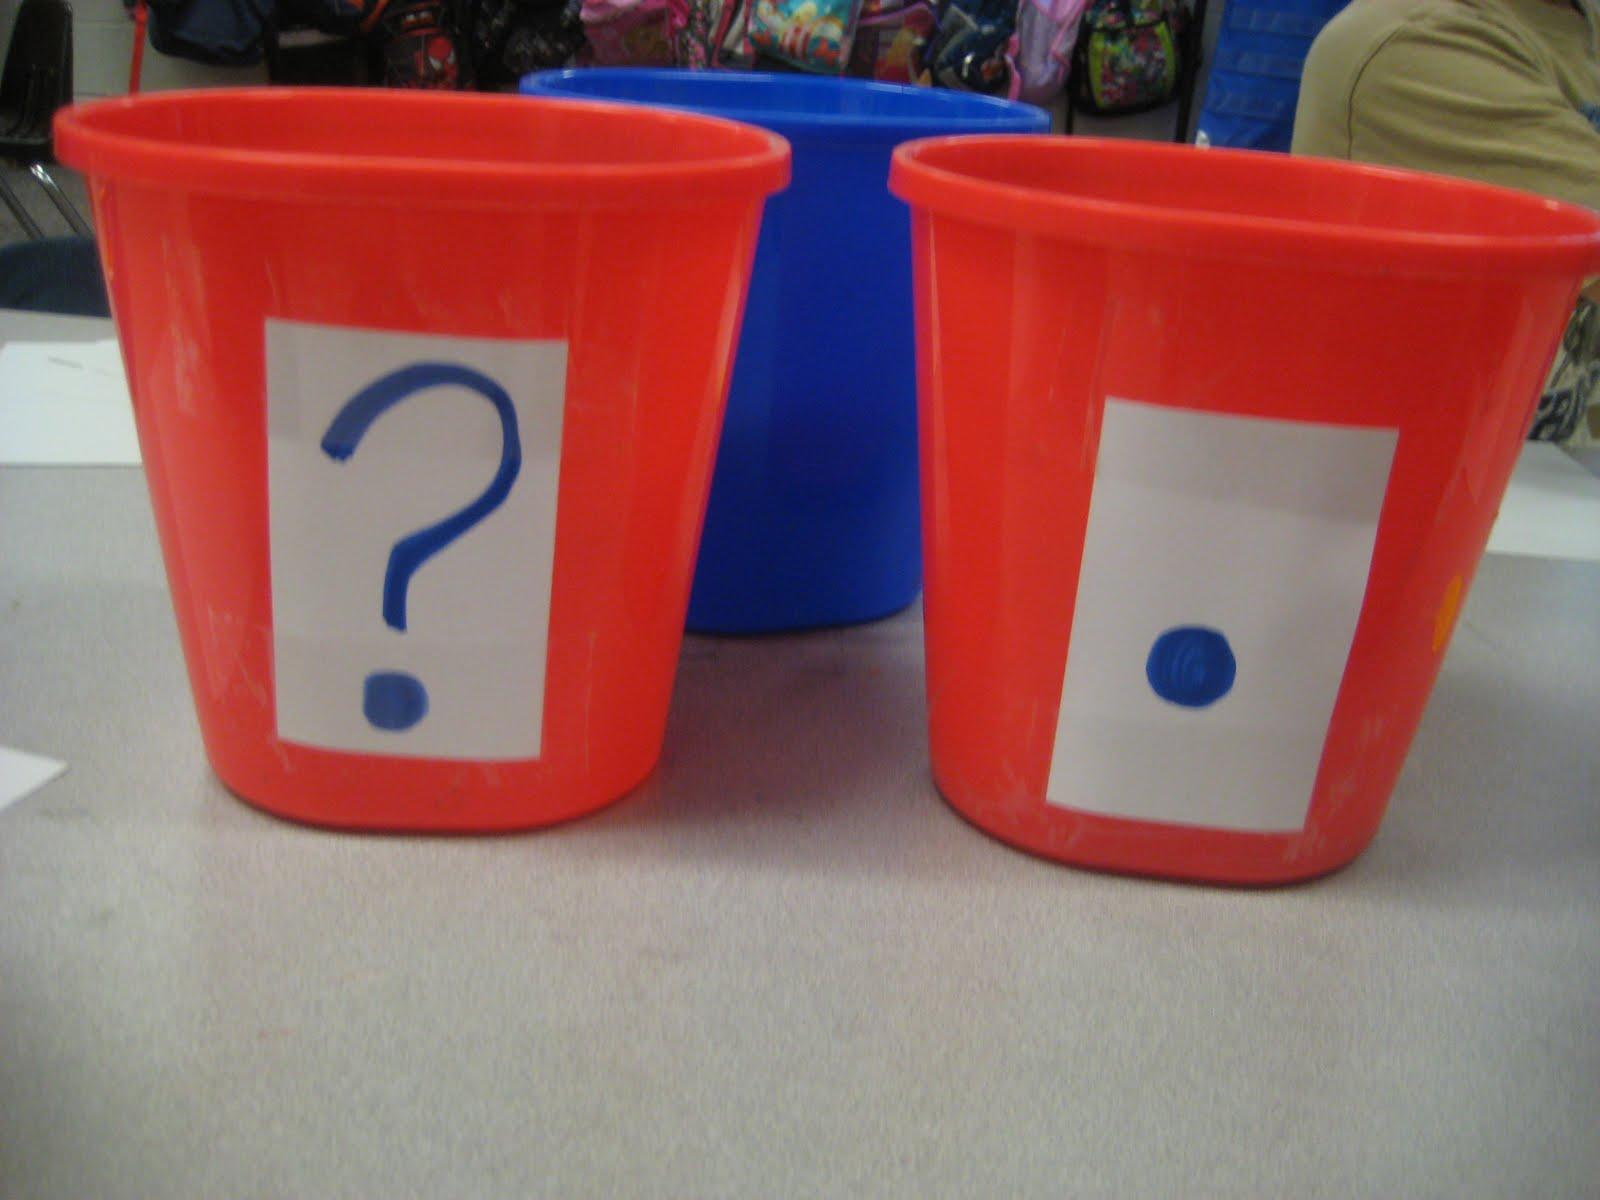 Kinder garden period or question mark for Kinder gardine